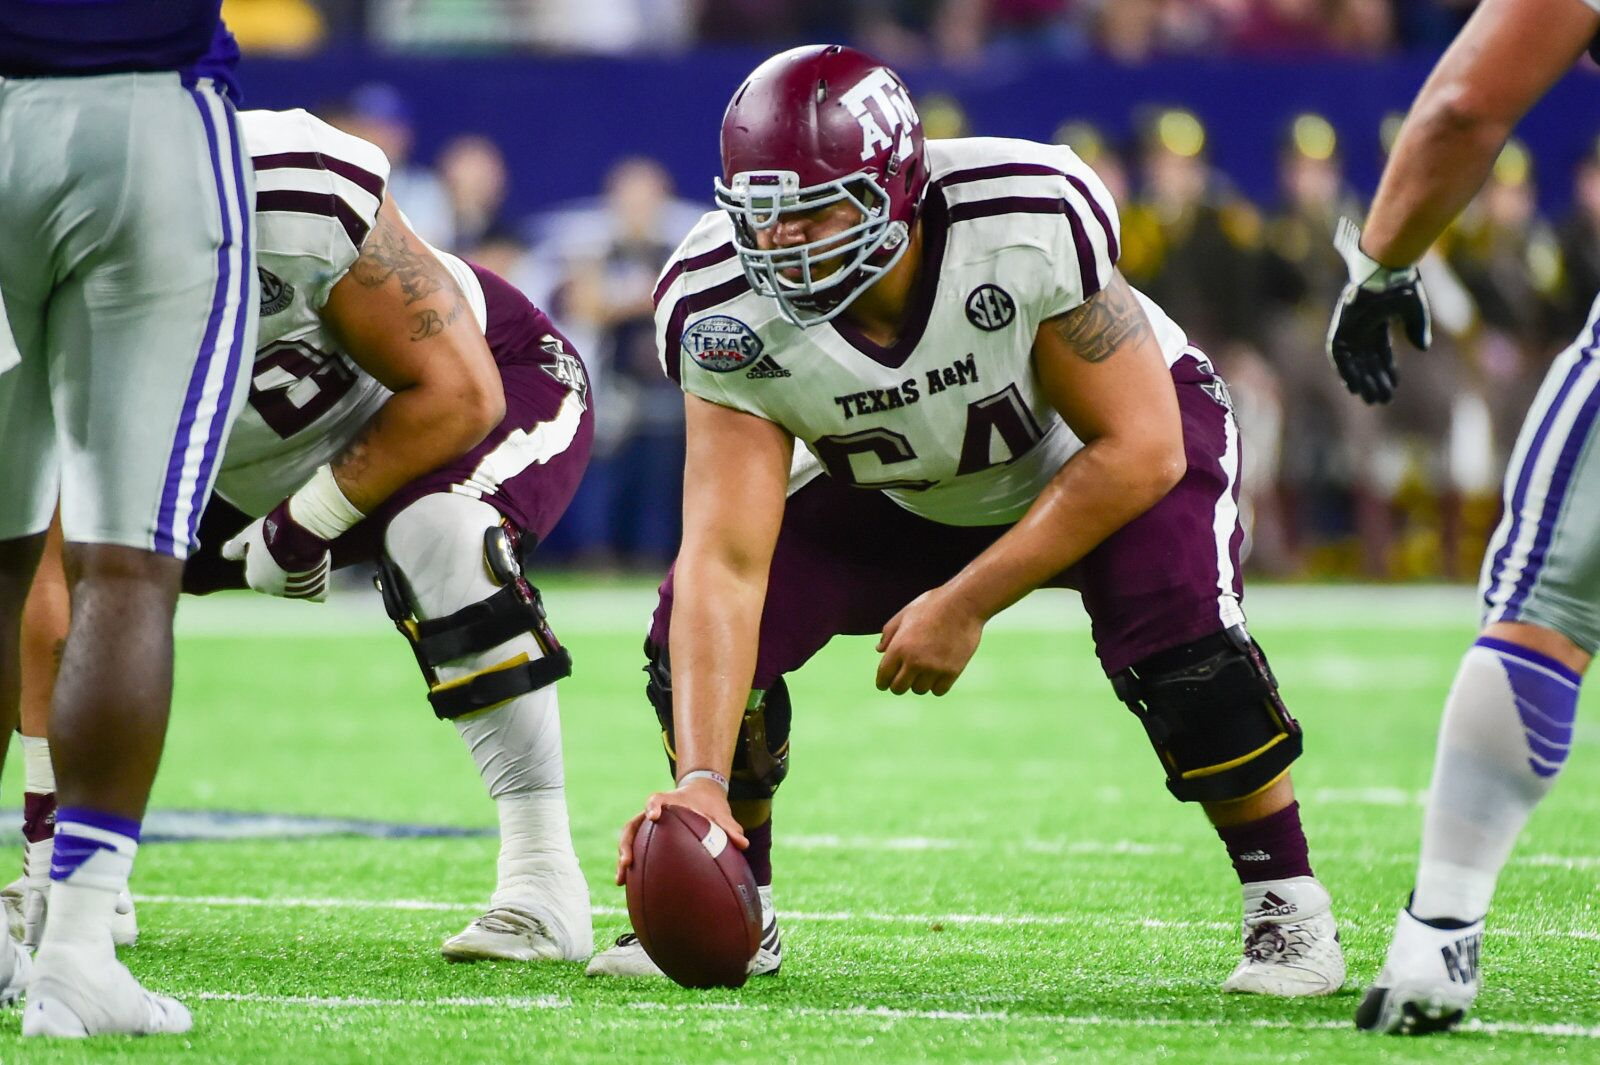 Texas A&M football: Final NFL Draft predictions for Erik McCoy